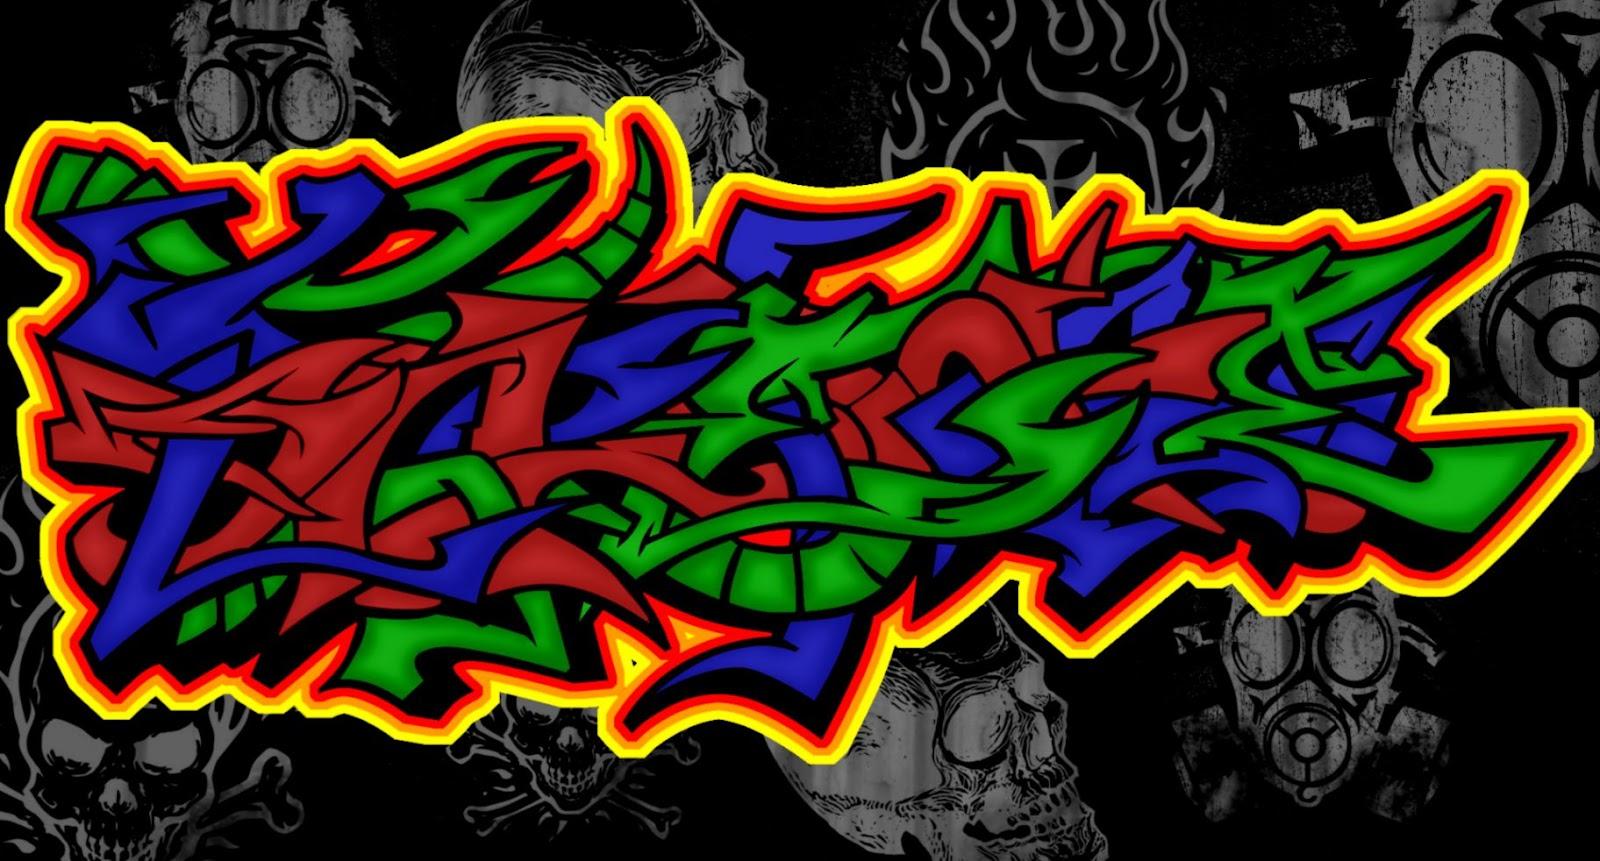 Music Graffiti Wallpapers: Music Graffiti Hd Wallpaper Desktop